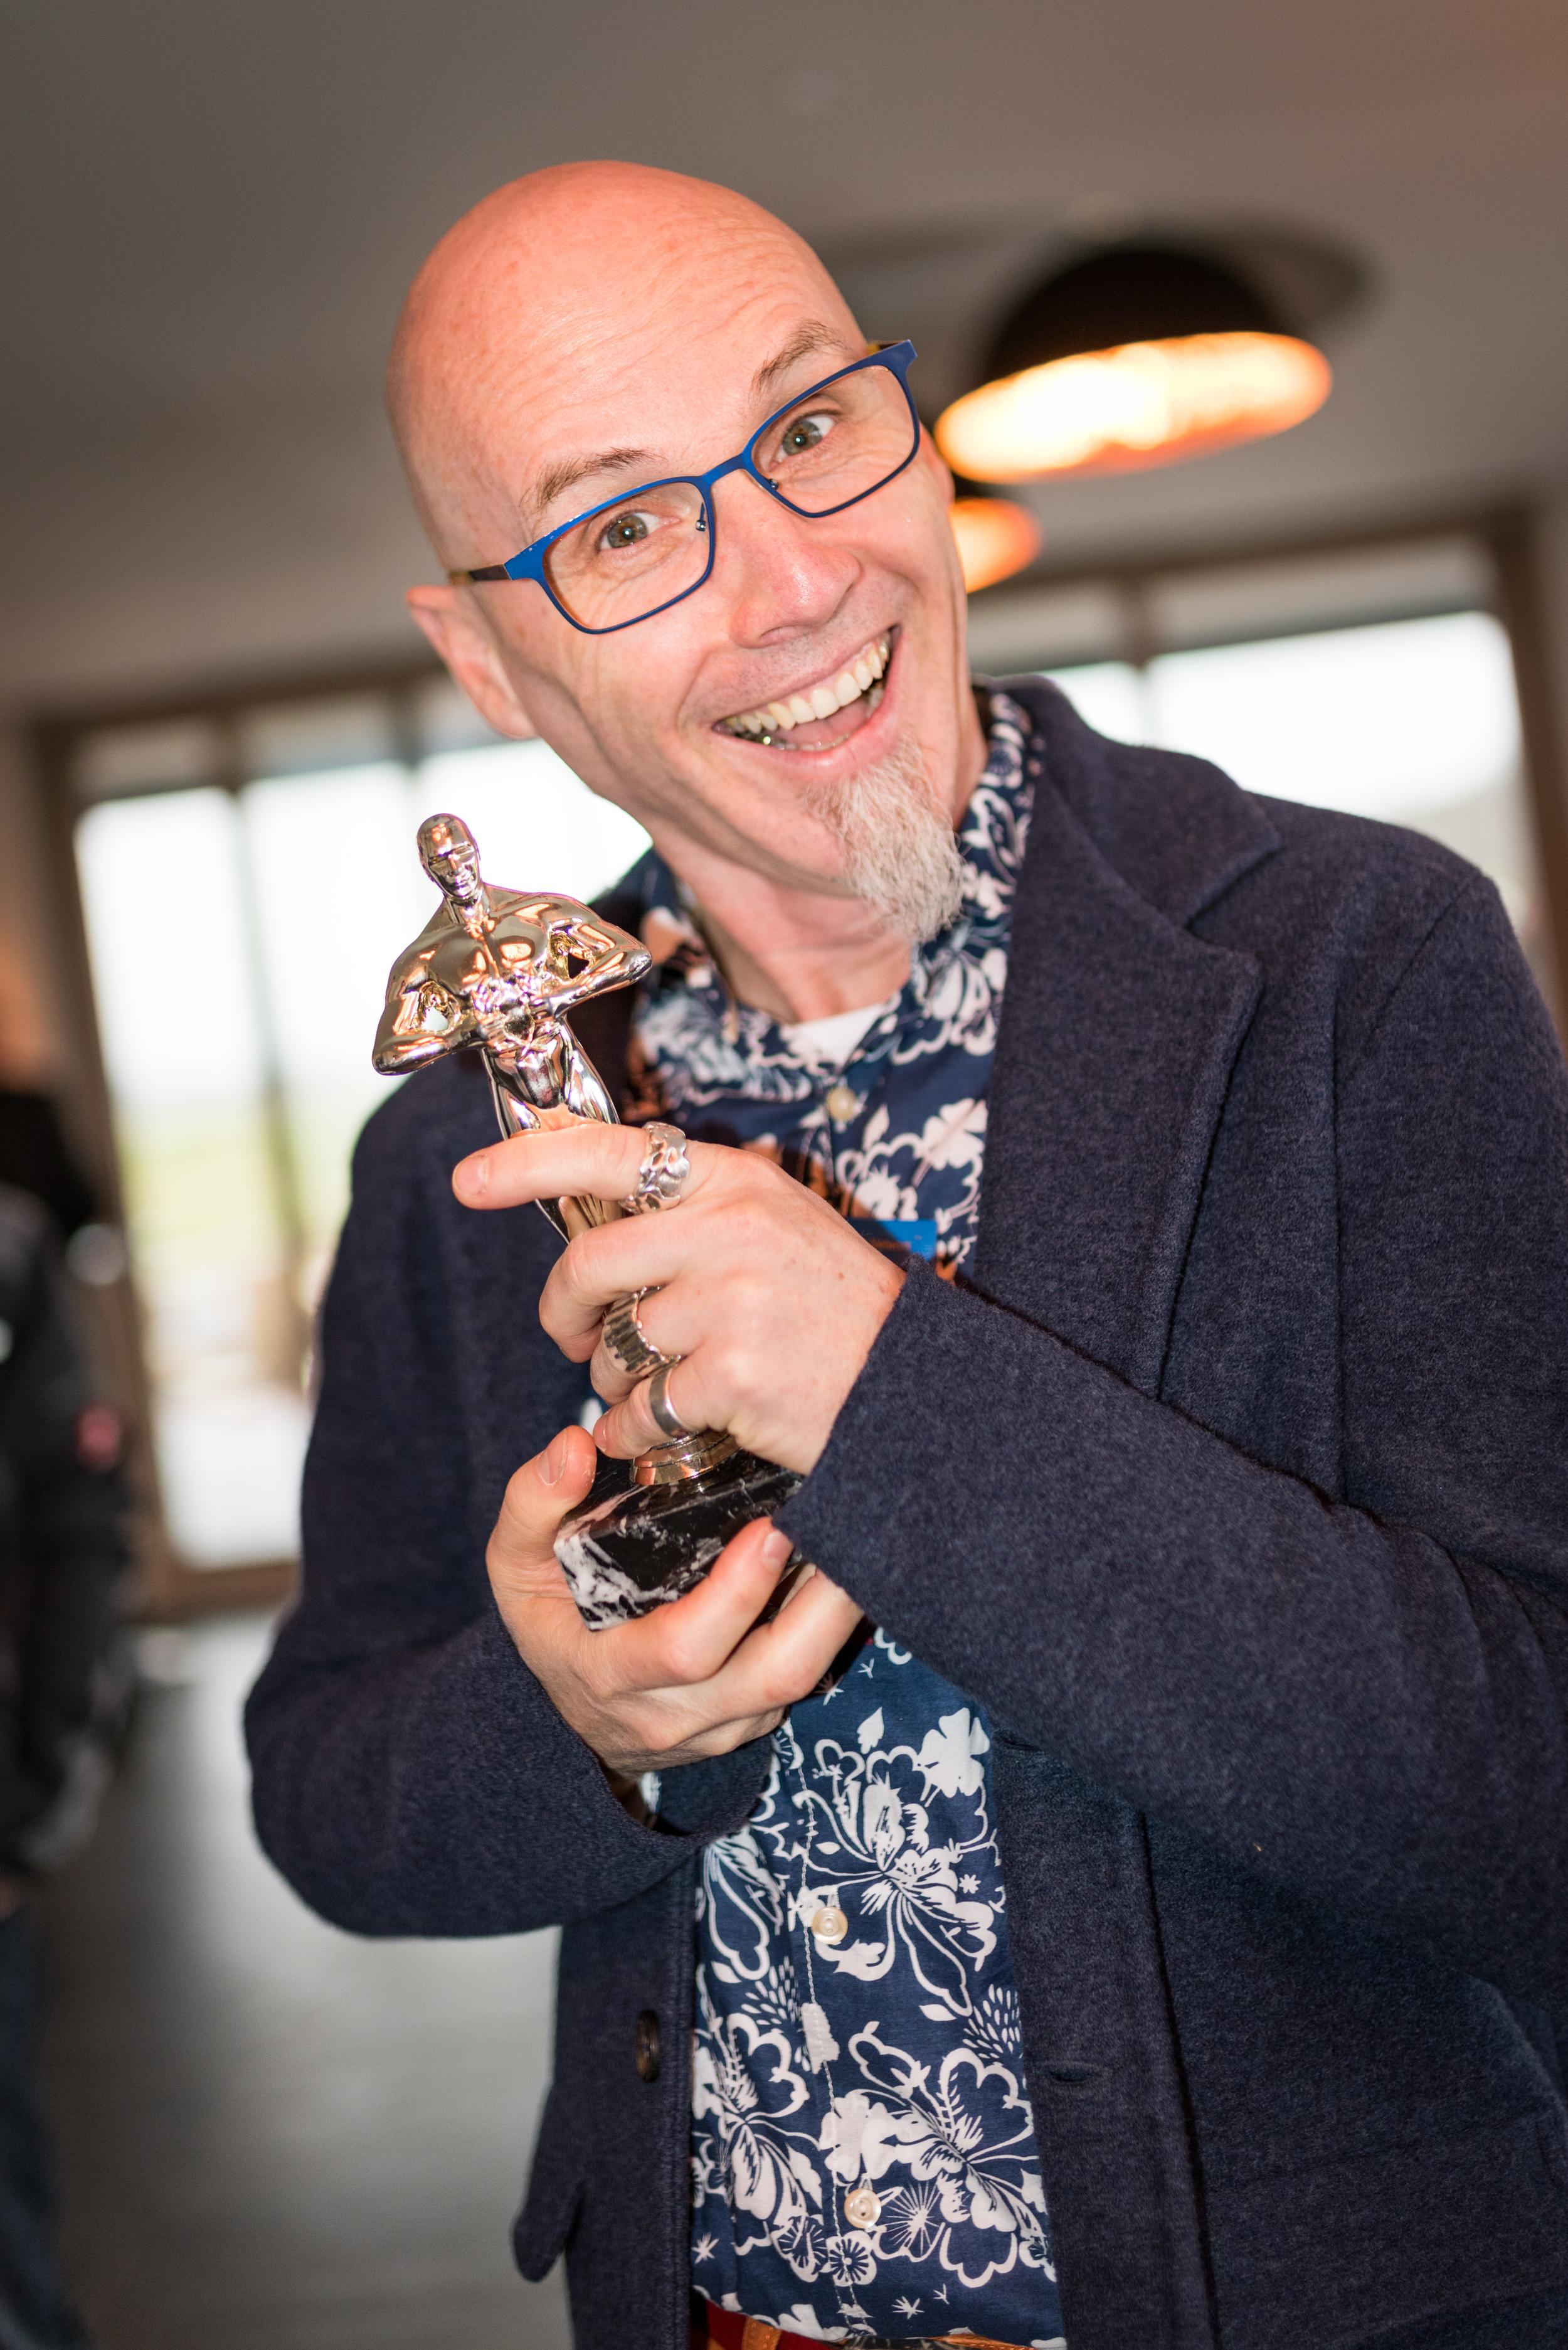 The Oscar goes to Edgar Sonnenfroh